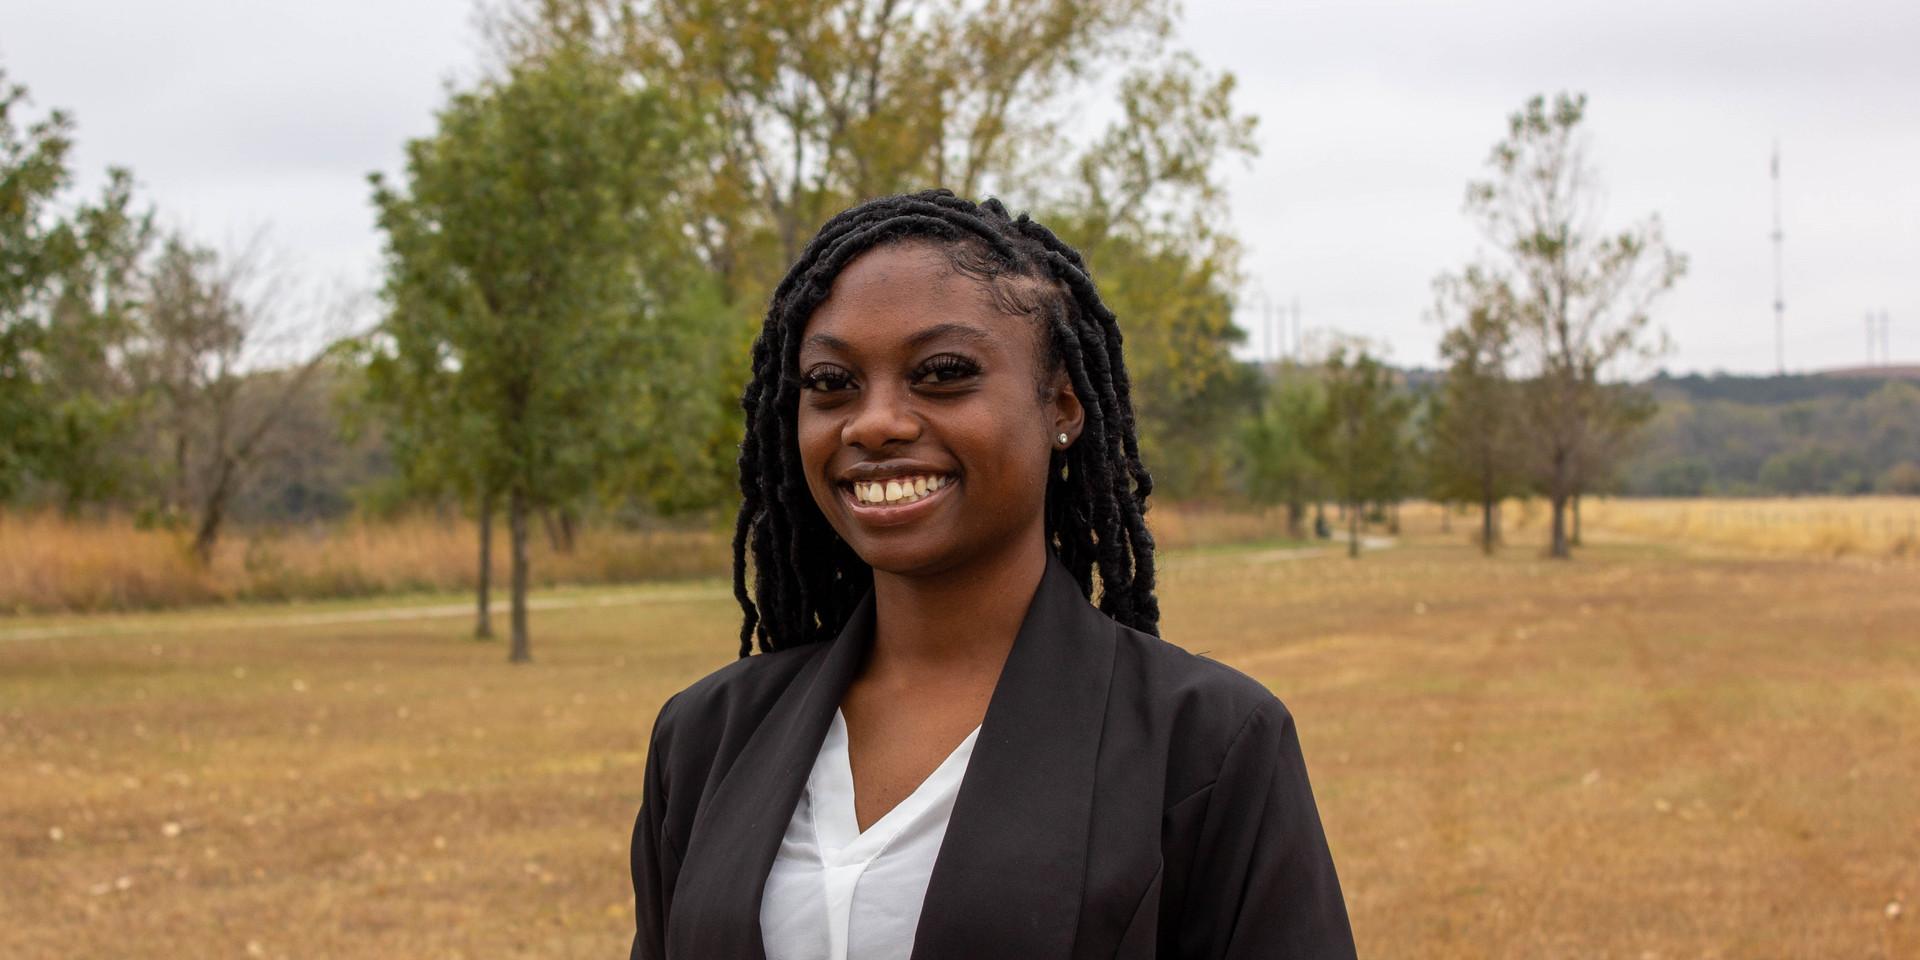 Jazmine Johnson